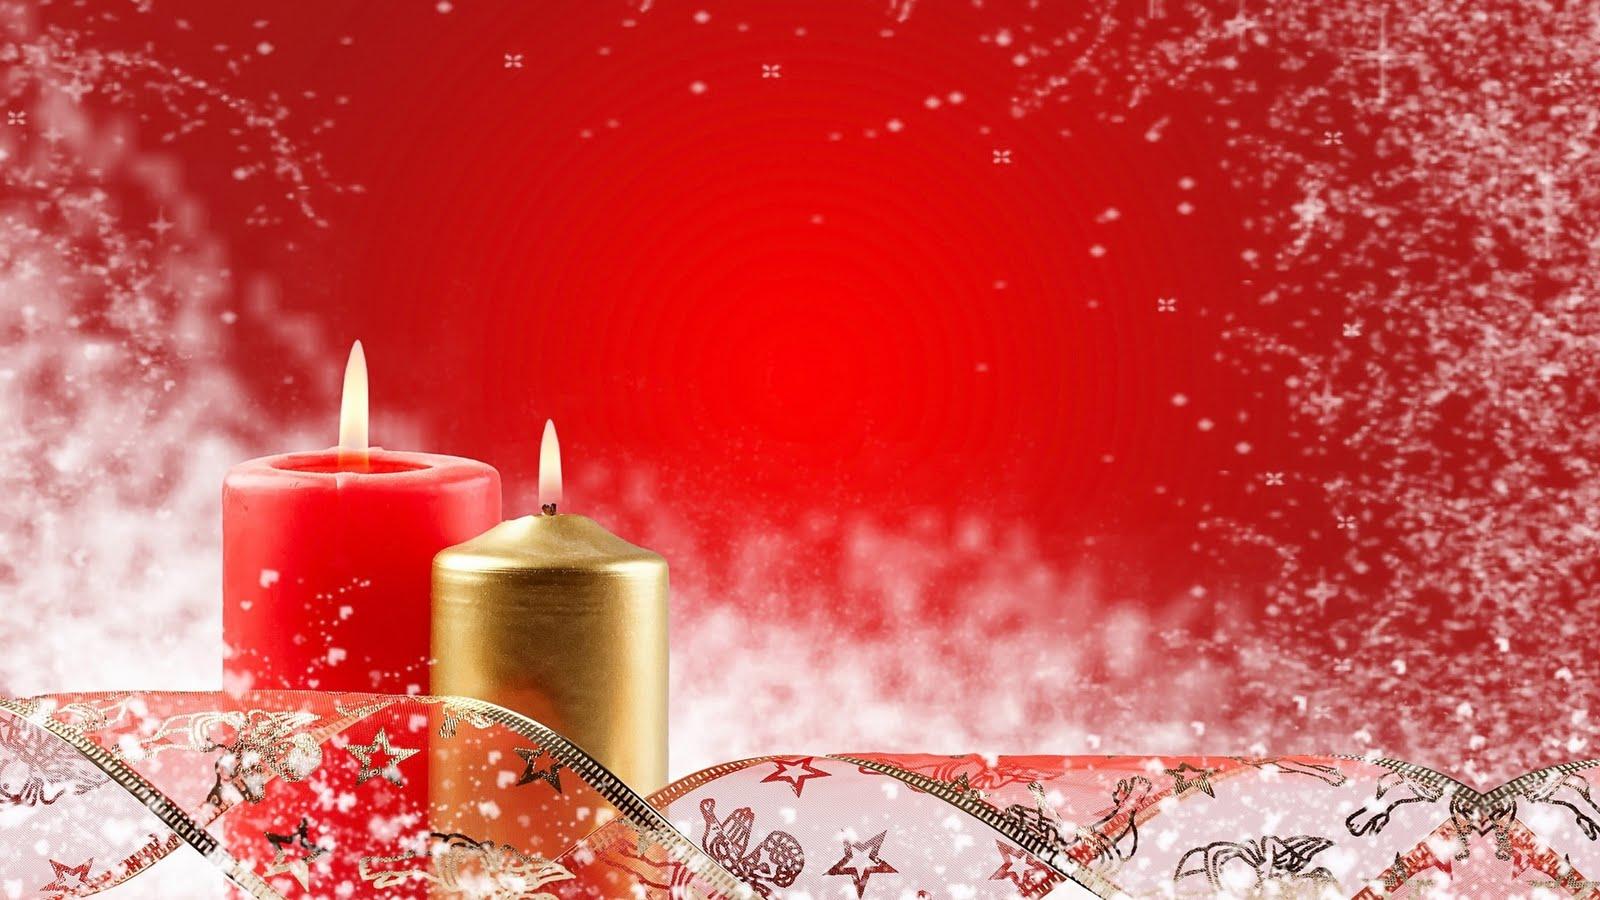 Holy Christmas 2012 Greeting Animated Christmas Greeting Cards Free Download